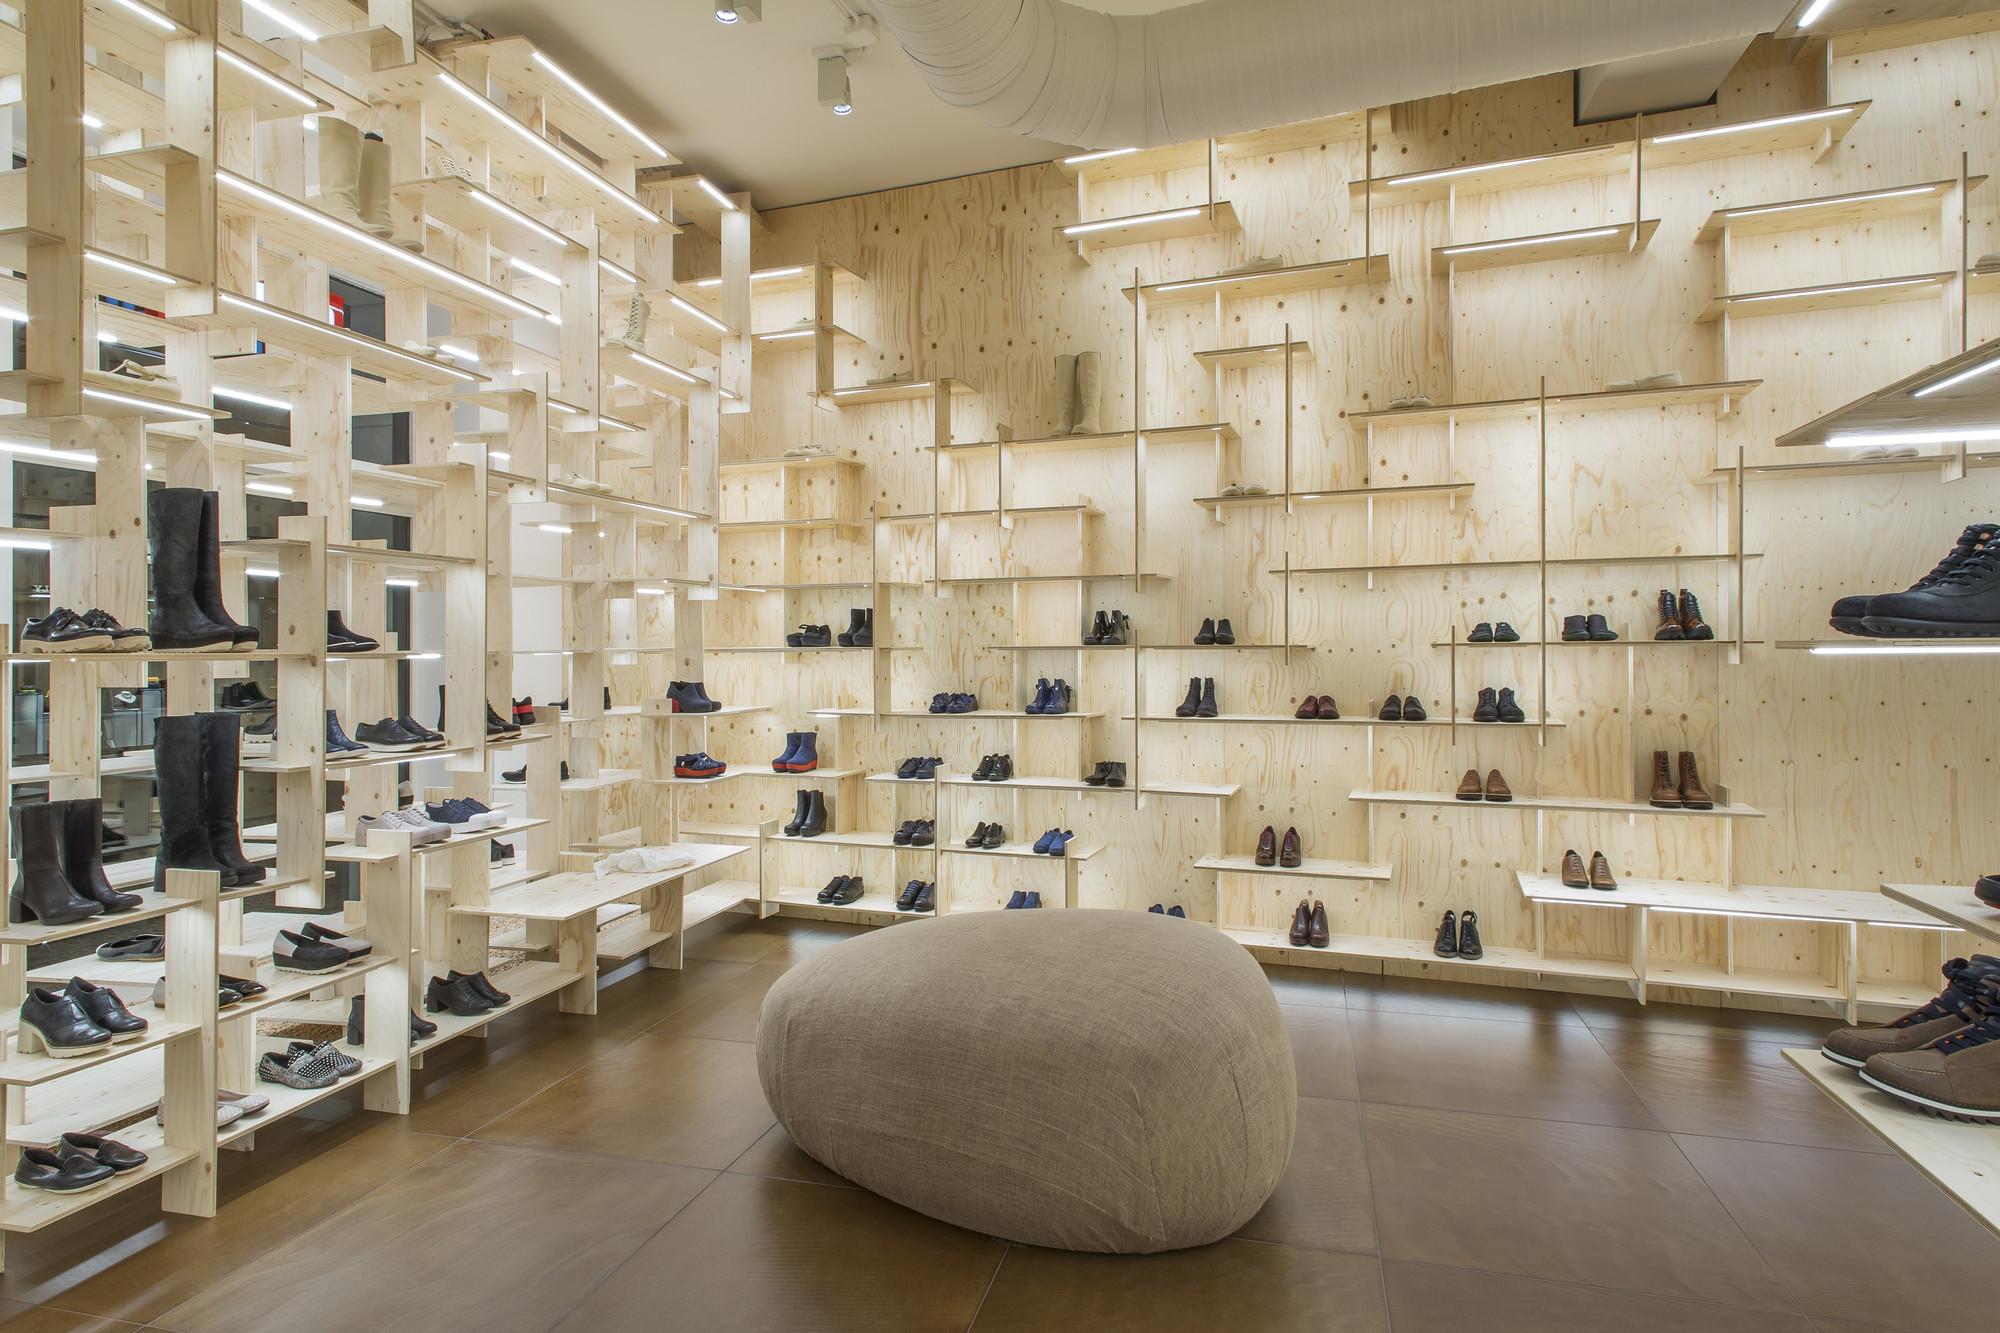 Camper store milano kengo kuma associates archdaily for Arquitectura interior